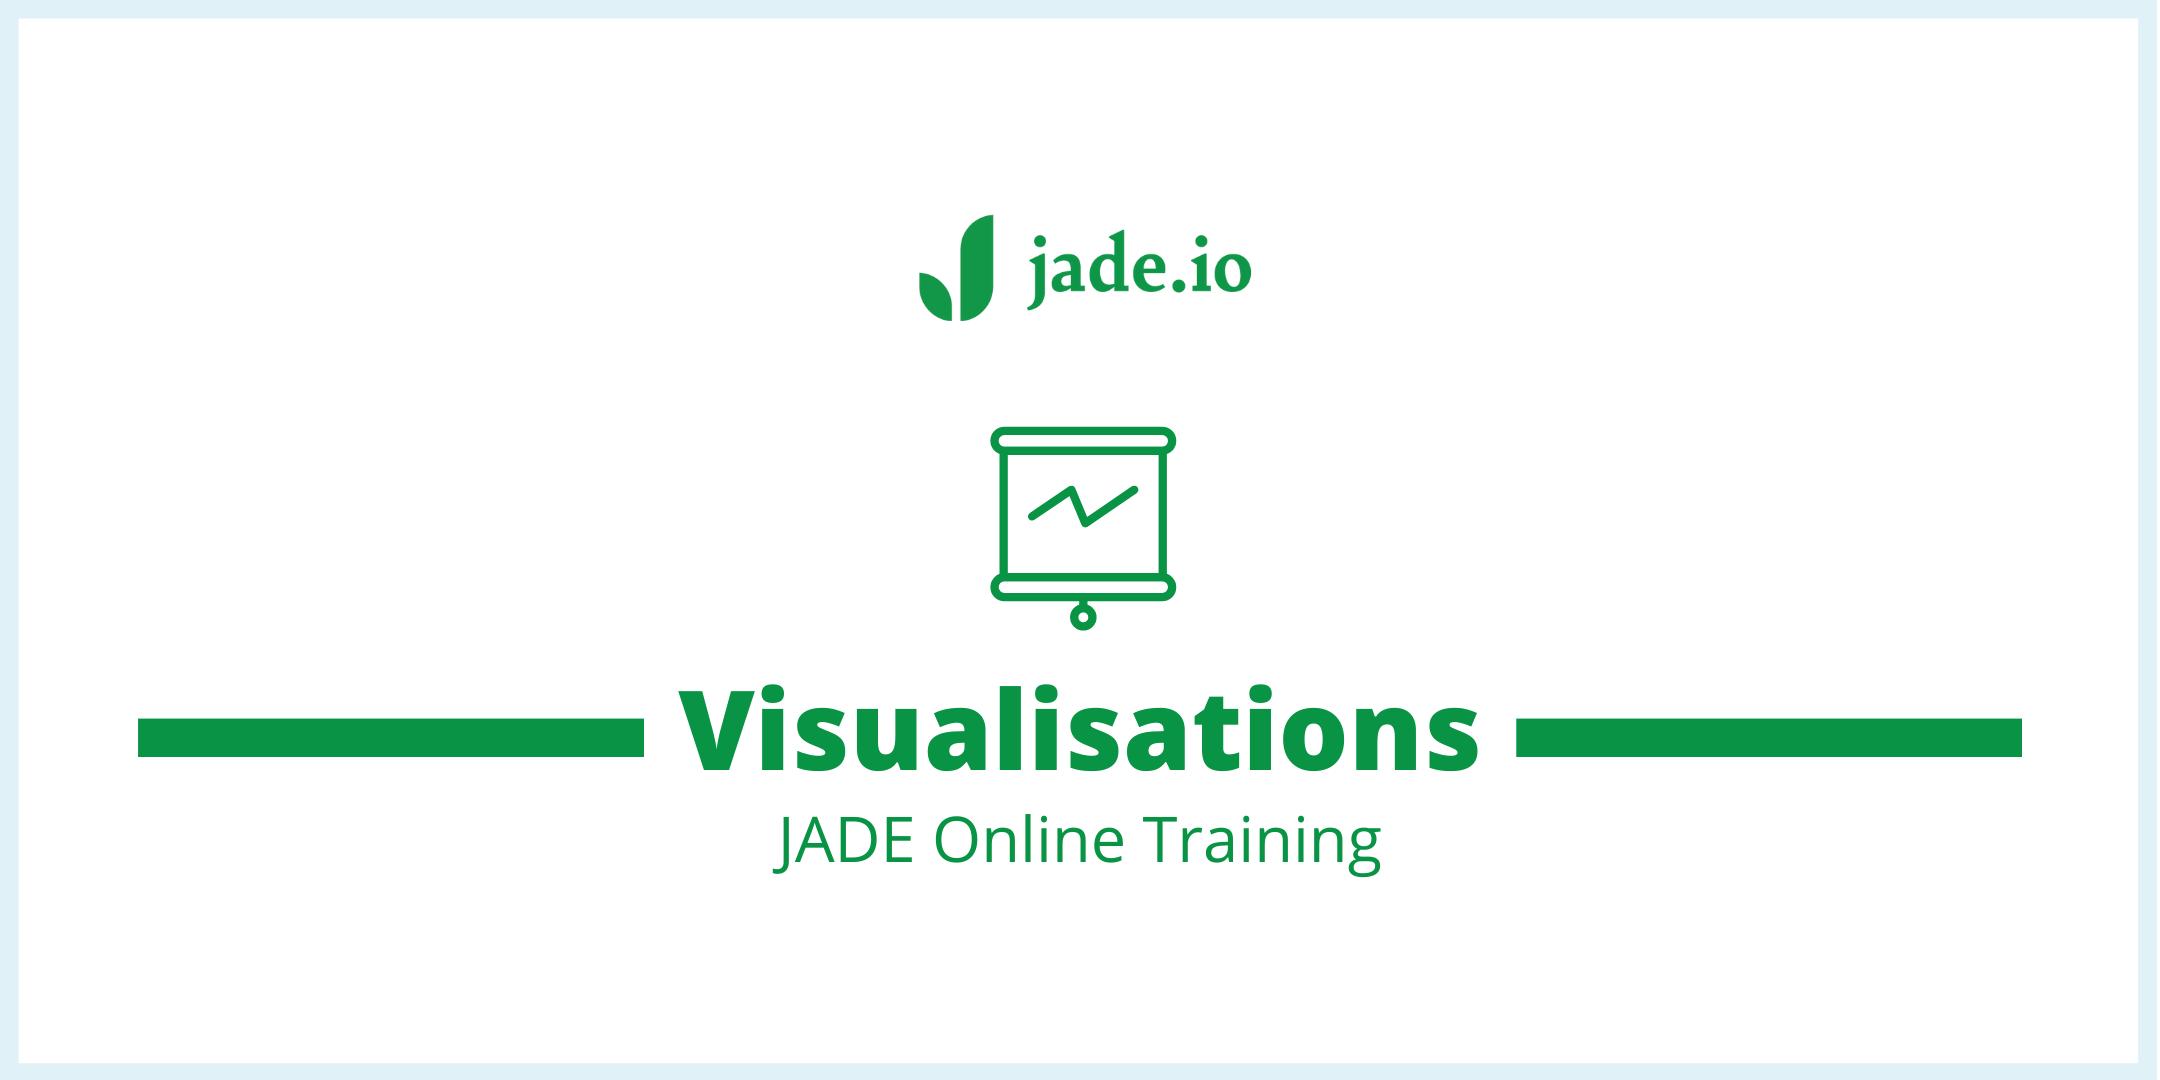 jade training banner with jade.io logo with heading Visualisations JADE Online Training